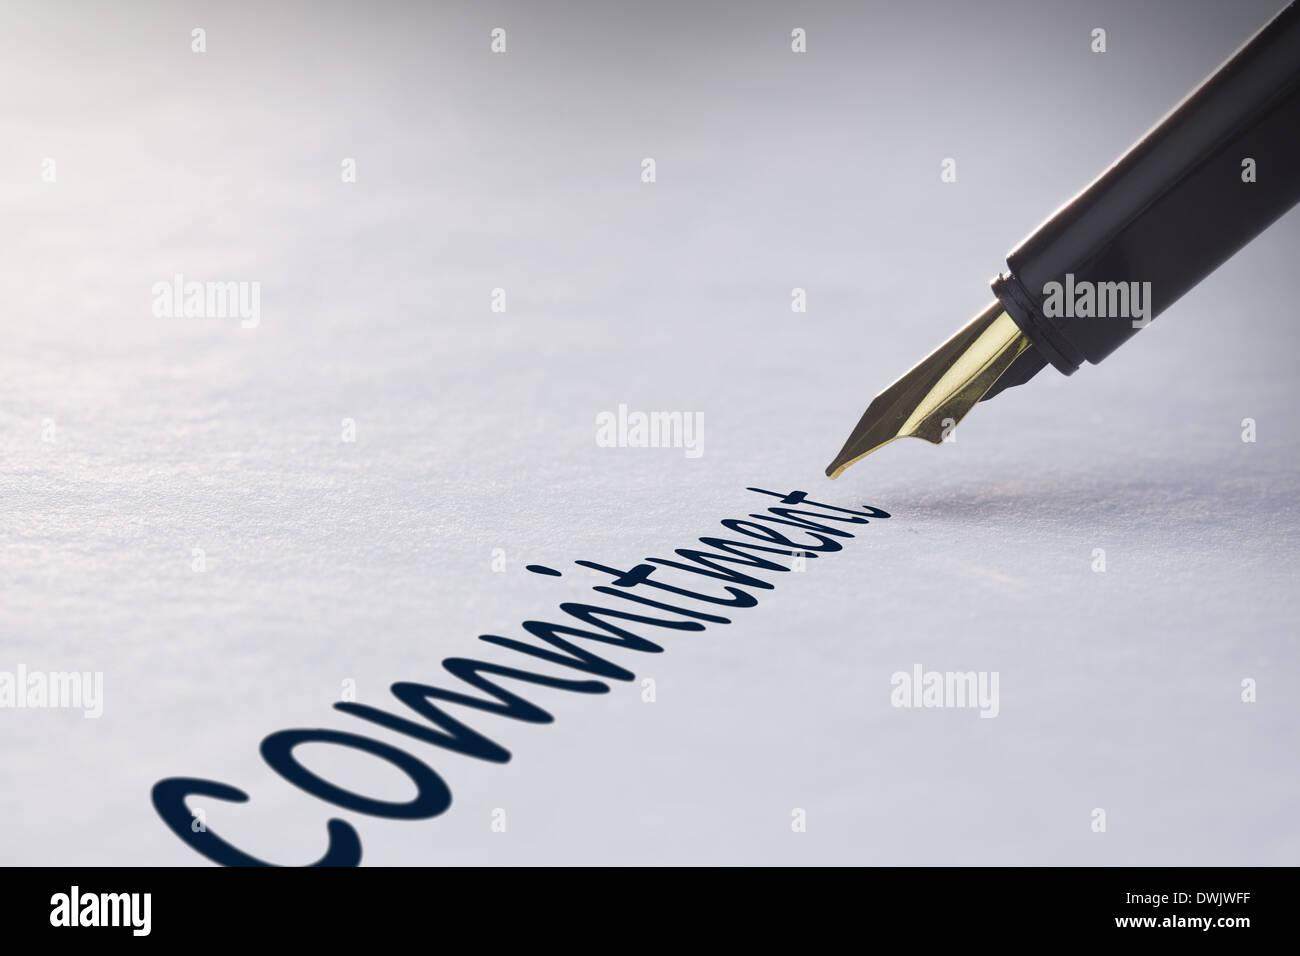 Estilográfica escrito compromiso Imagen De Stock